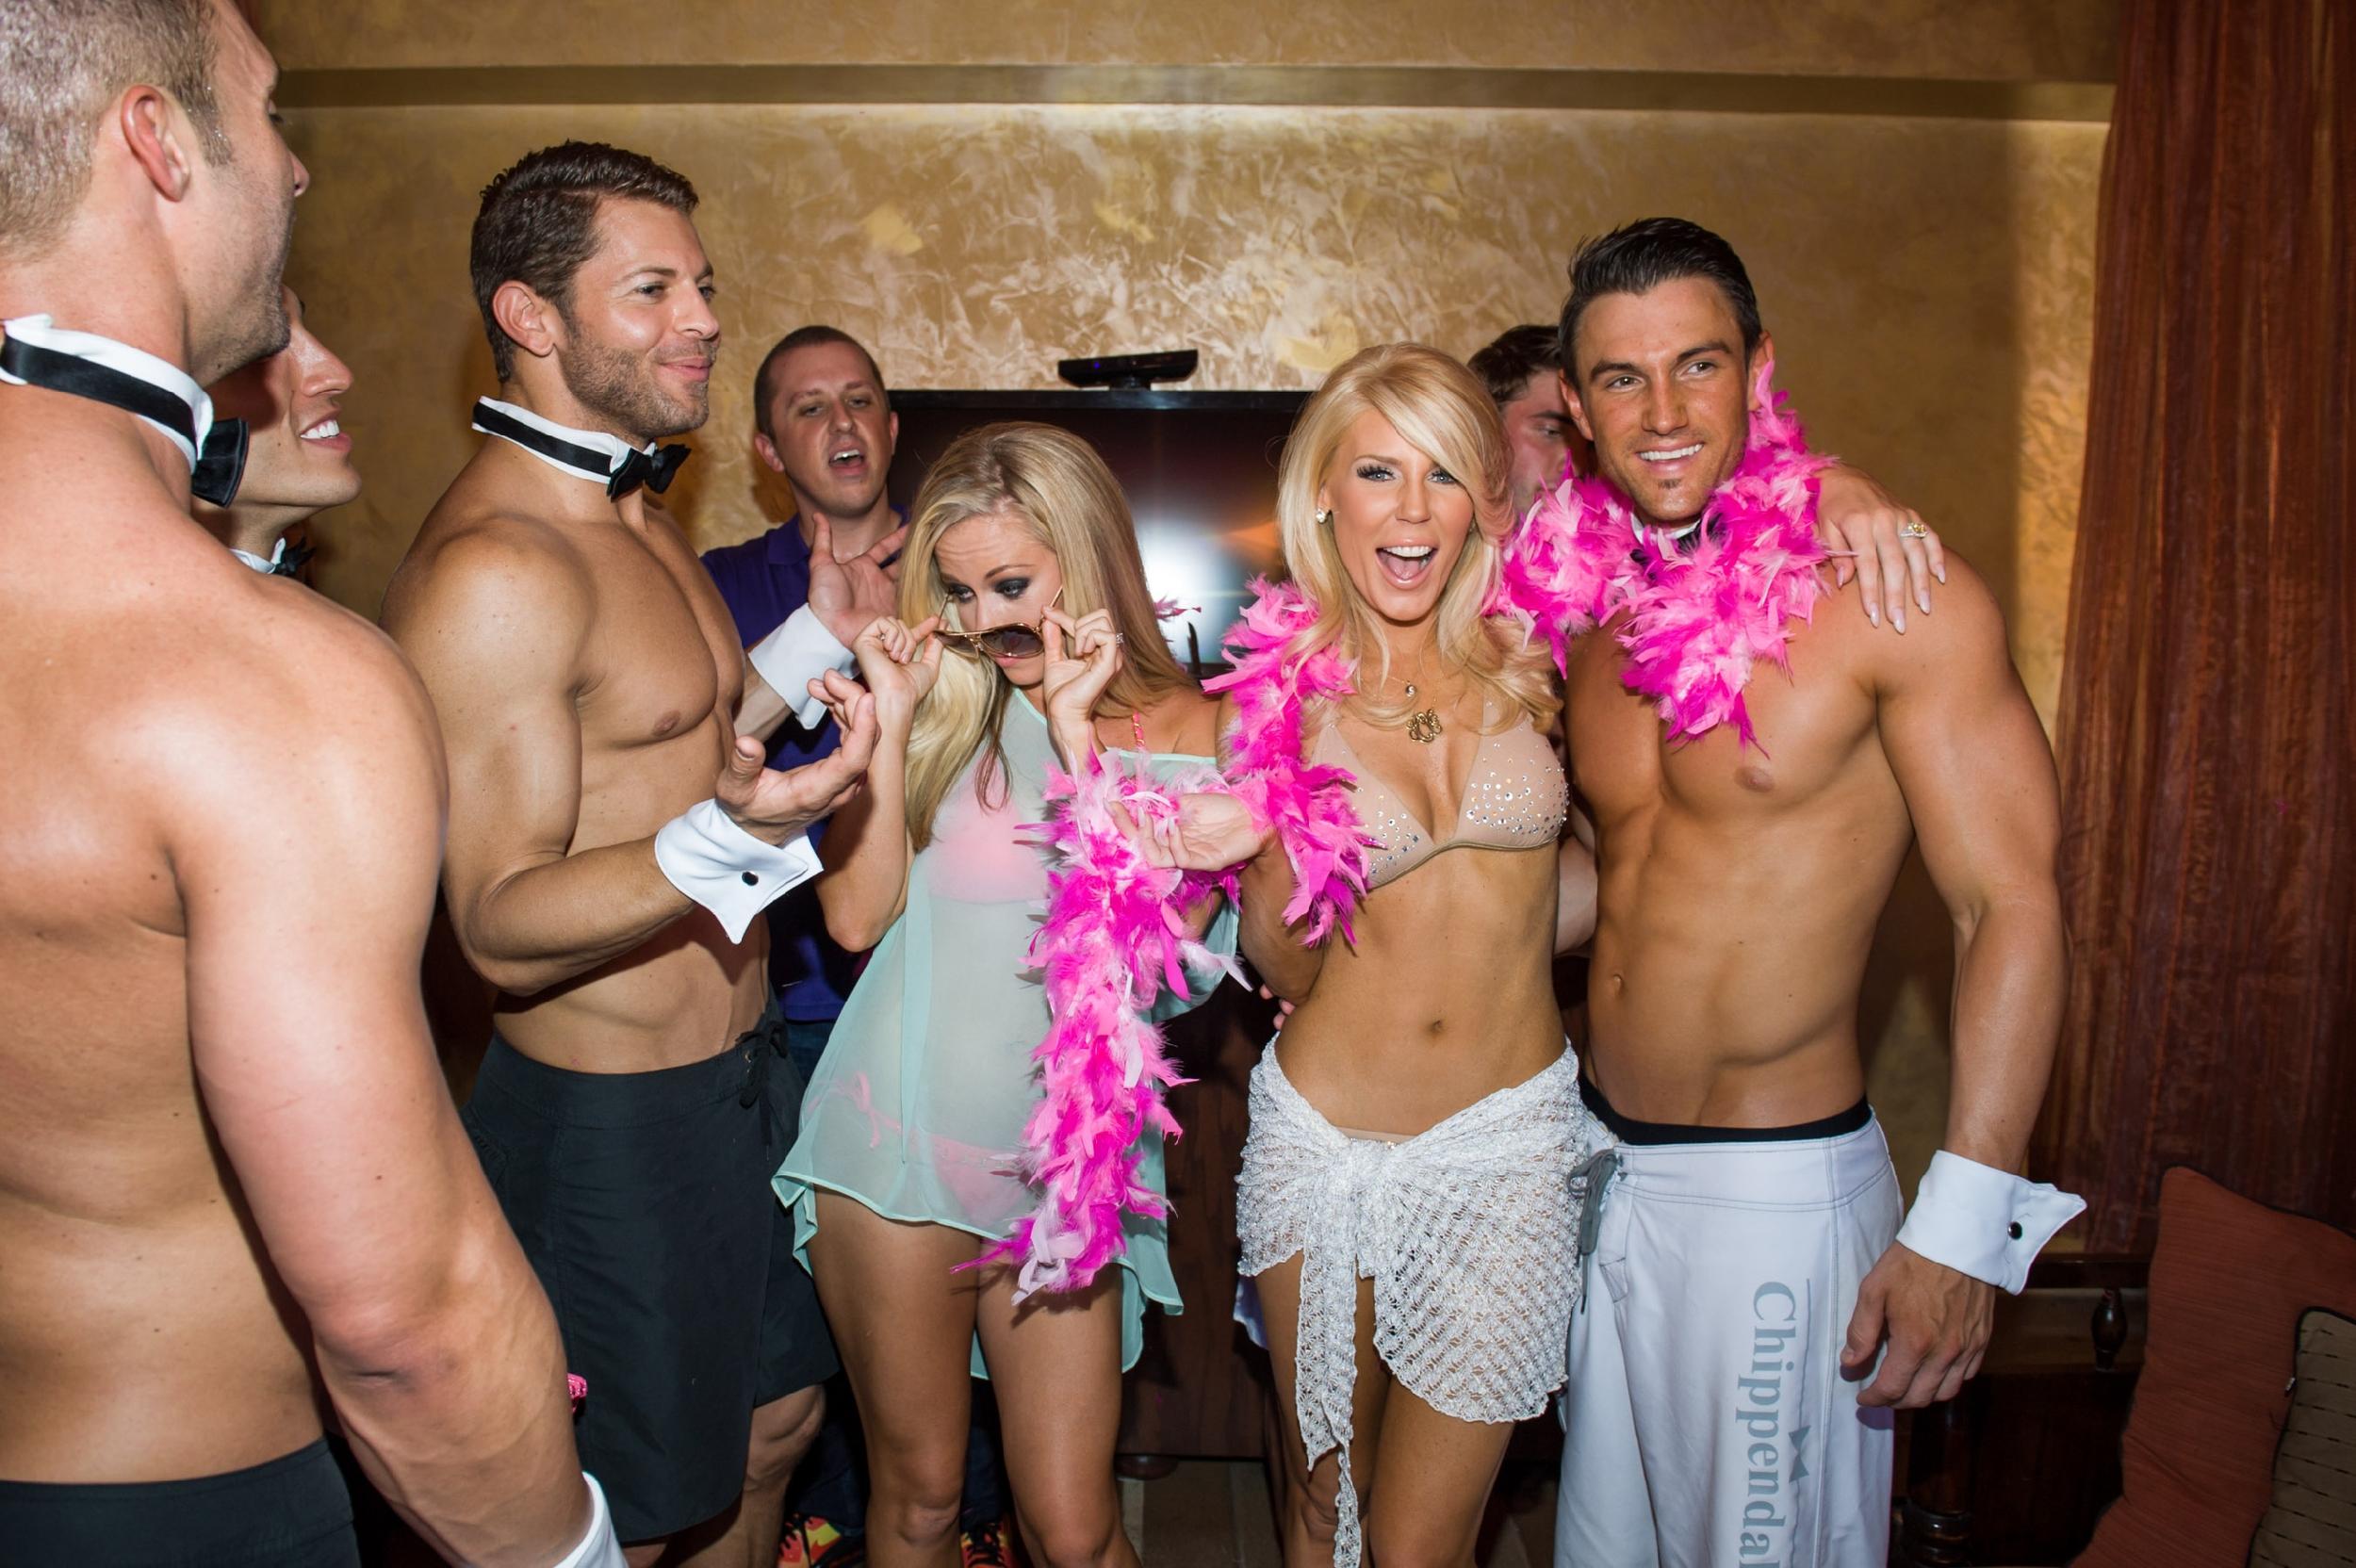 Sexy bachelorette parties